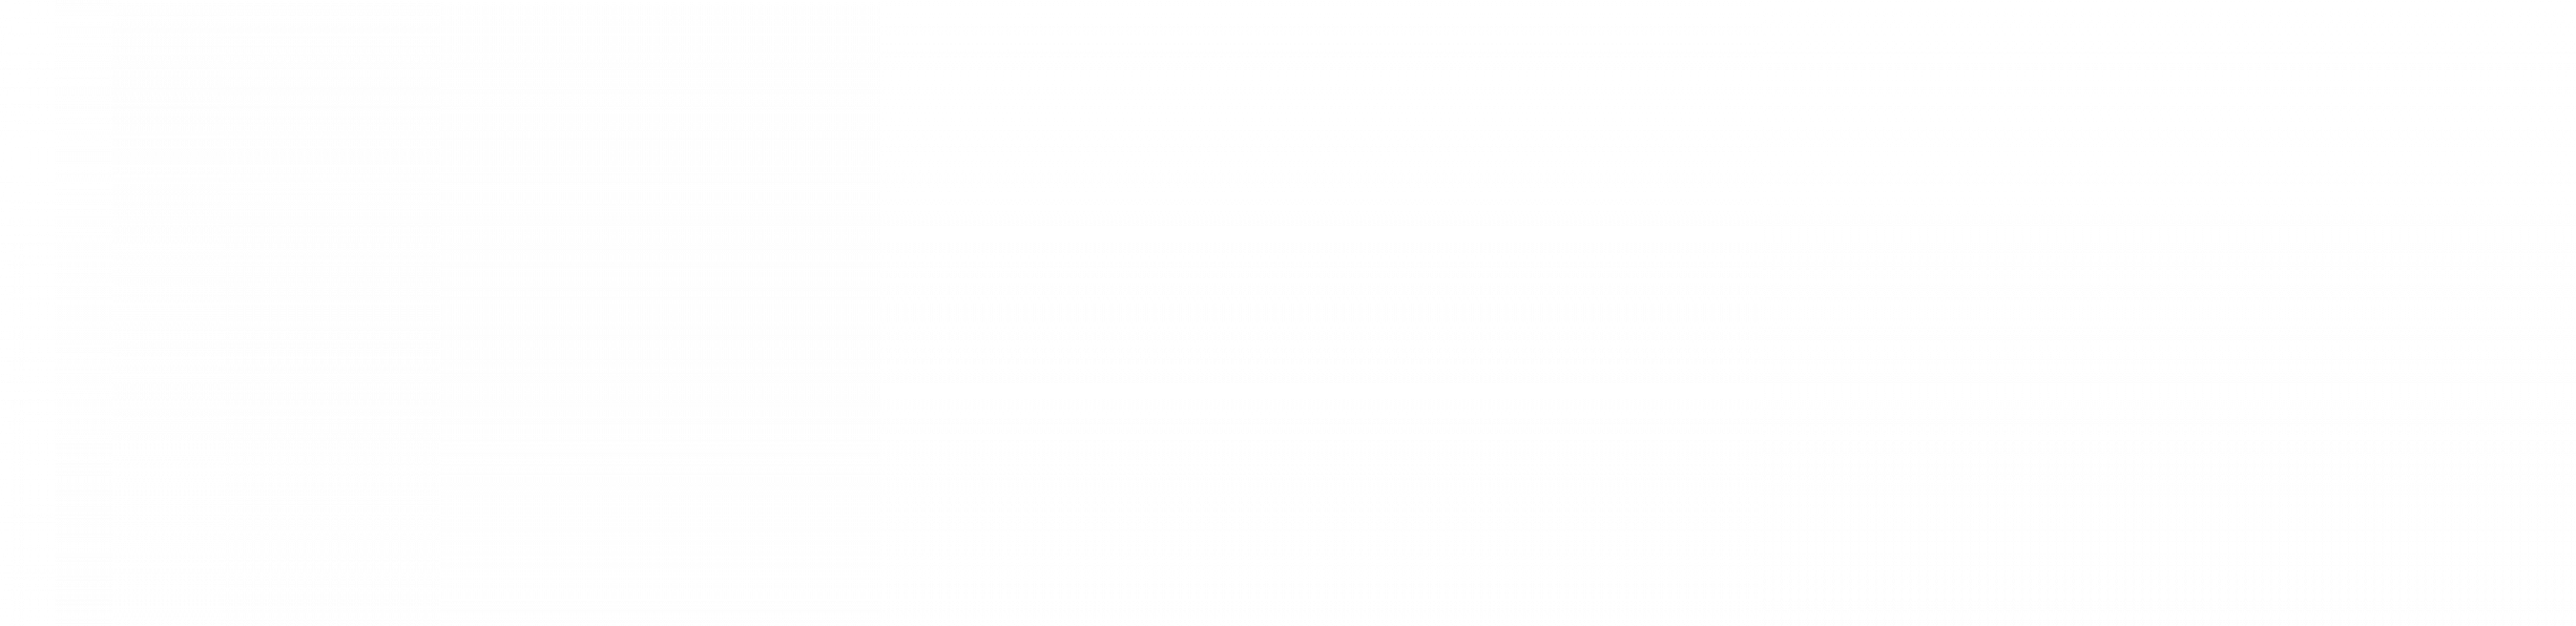 2019 CES Logo – Solution White background